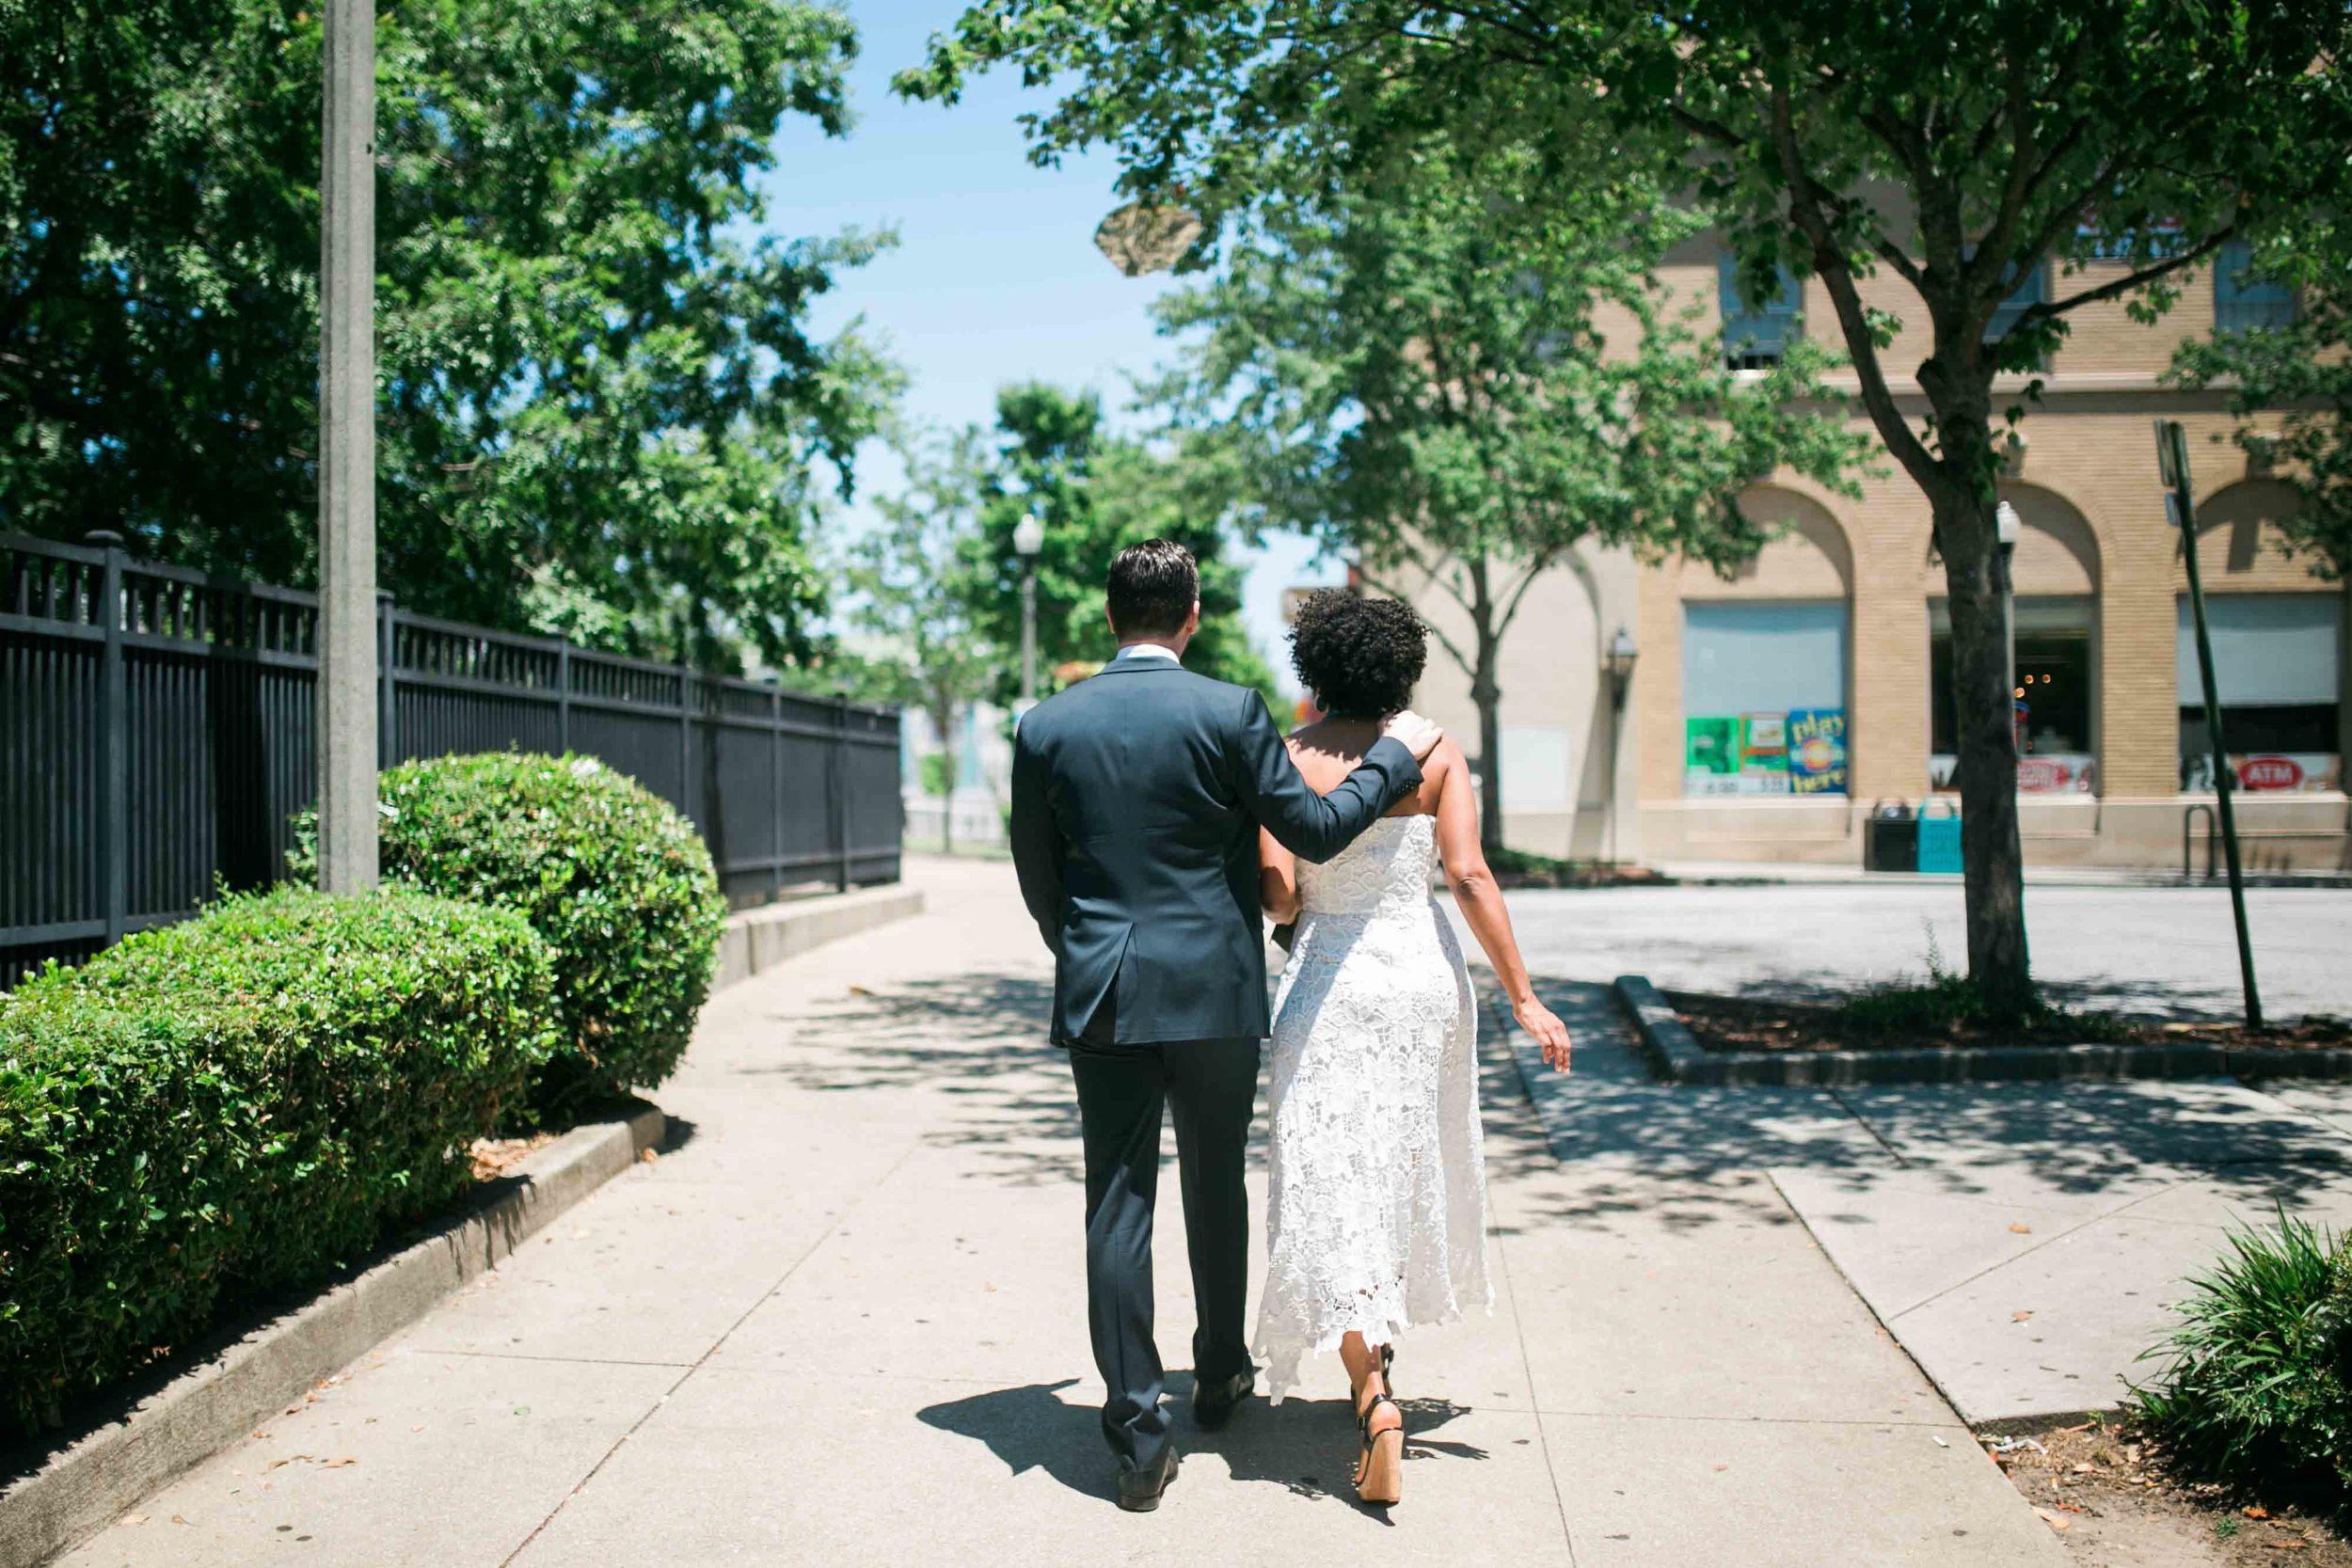 Dekalb-County-Courthouse-Wedding-Photos-Kiyah-C-Photography-43.jpg